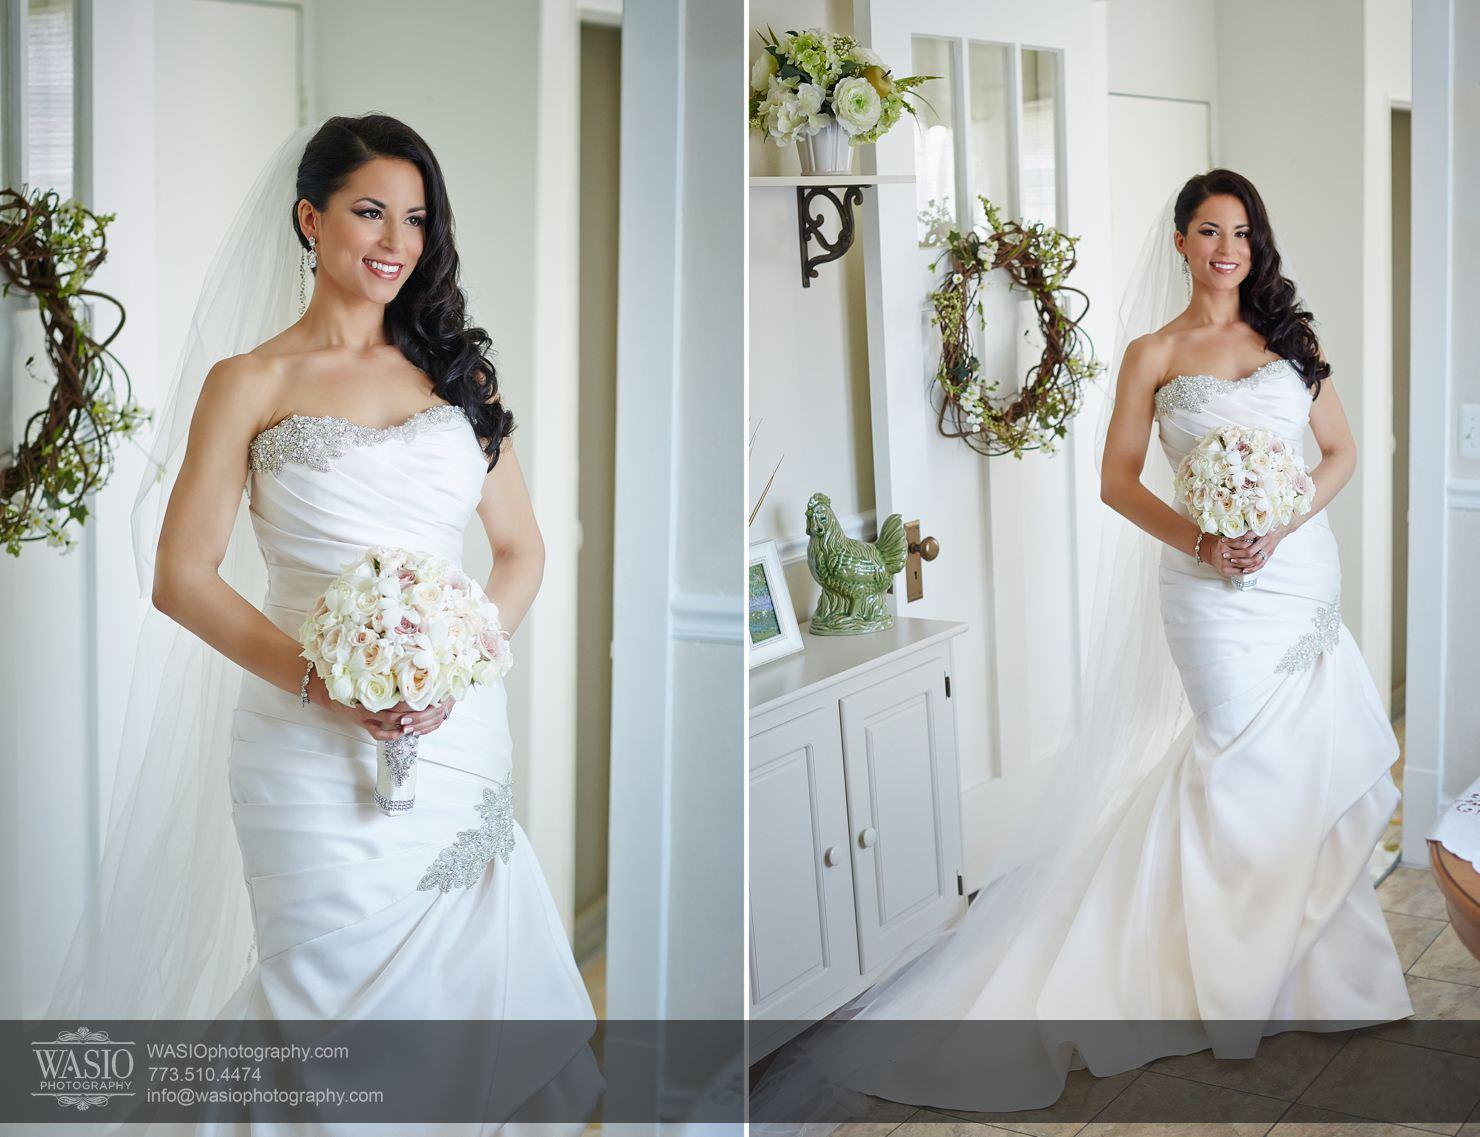 012_Chicago-Spring-Wedding_Chrissy-Andrew_3P4C5419-copy Chicago Spring Wedding - Chrissy + Andrew